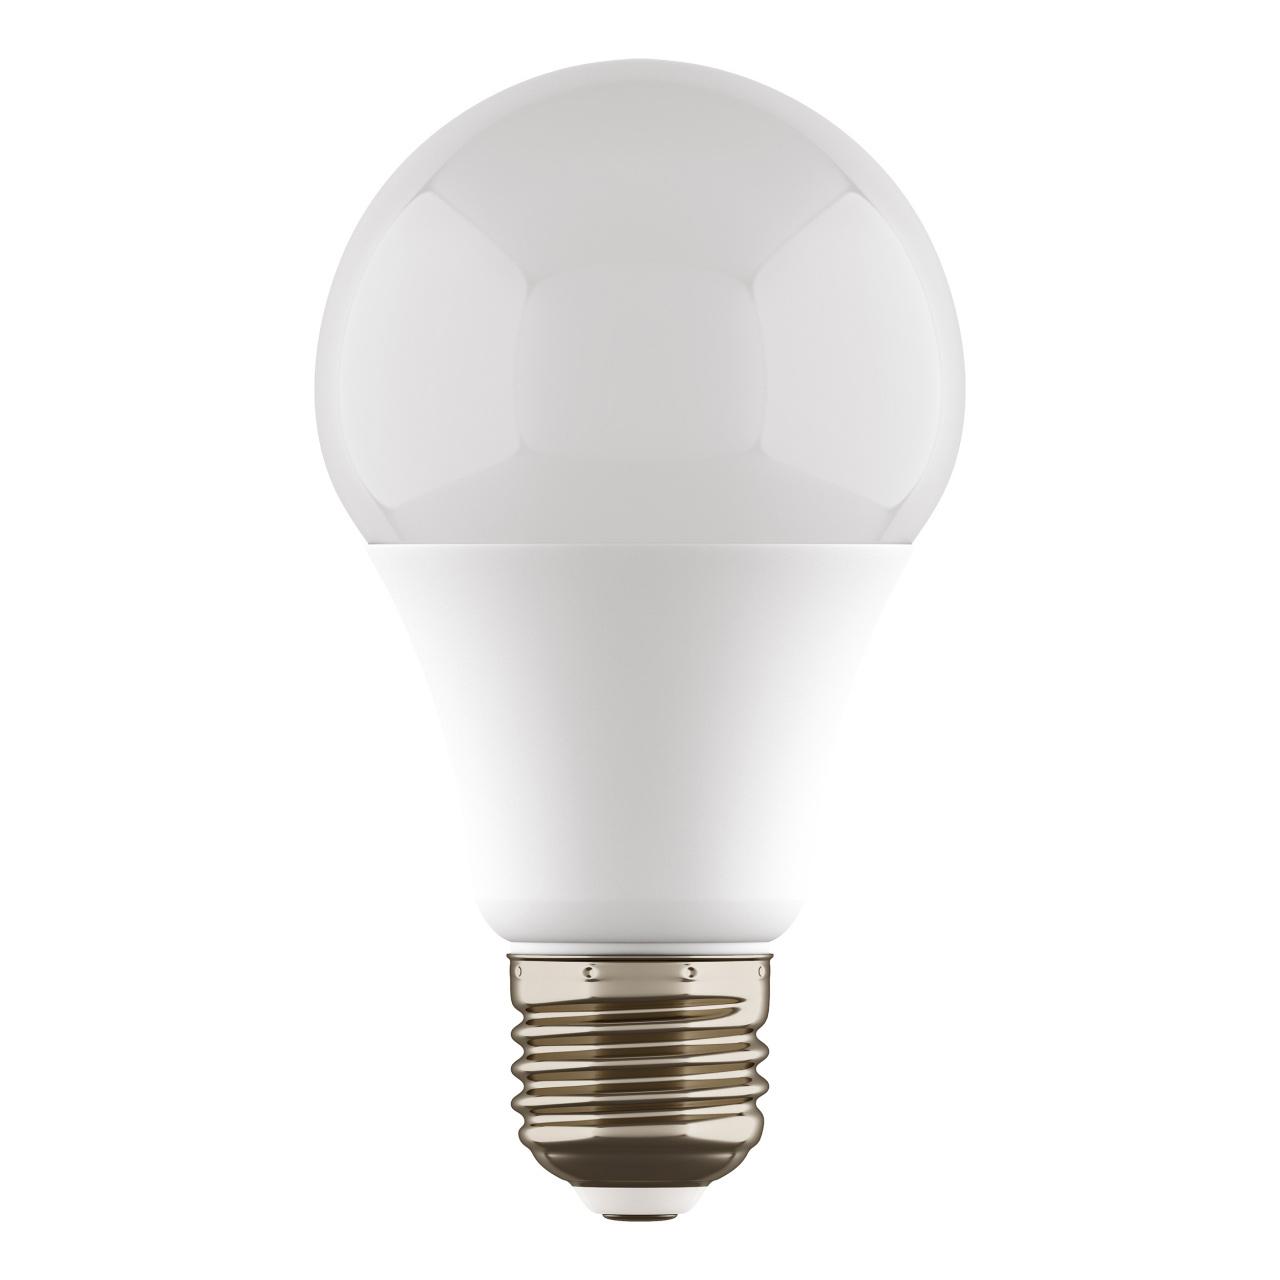 Лампа LED 220V A60 E27 9W=90W 600LM 180G FR 4000K 20000H Lightstar 940004